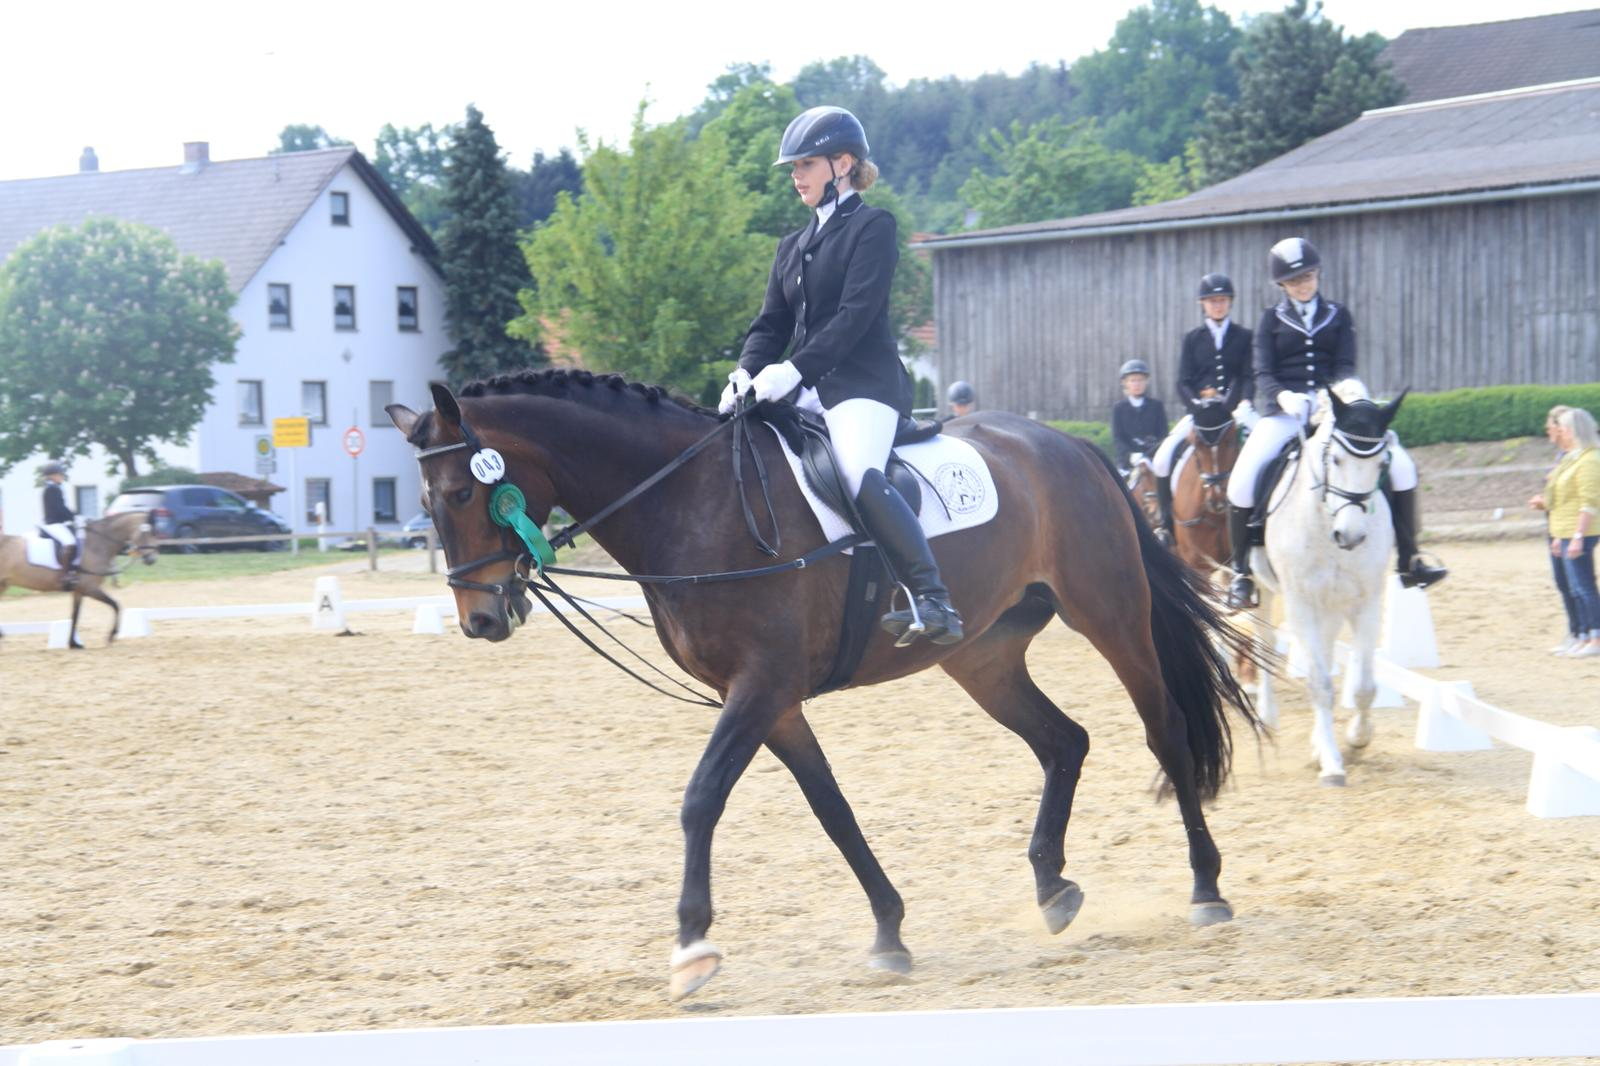 Turnier Obermünchen 10.05.18 Dressur-WB 244 E1, 6. Platz WN 6,7